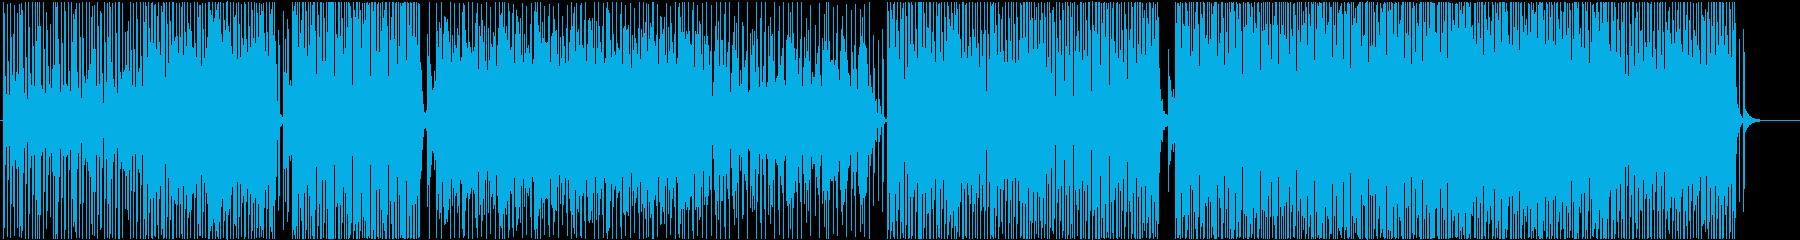 midテンポ-EDM-ハウス-PV-軽快の再生済みの波形